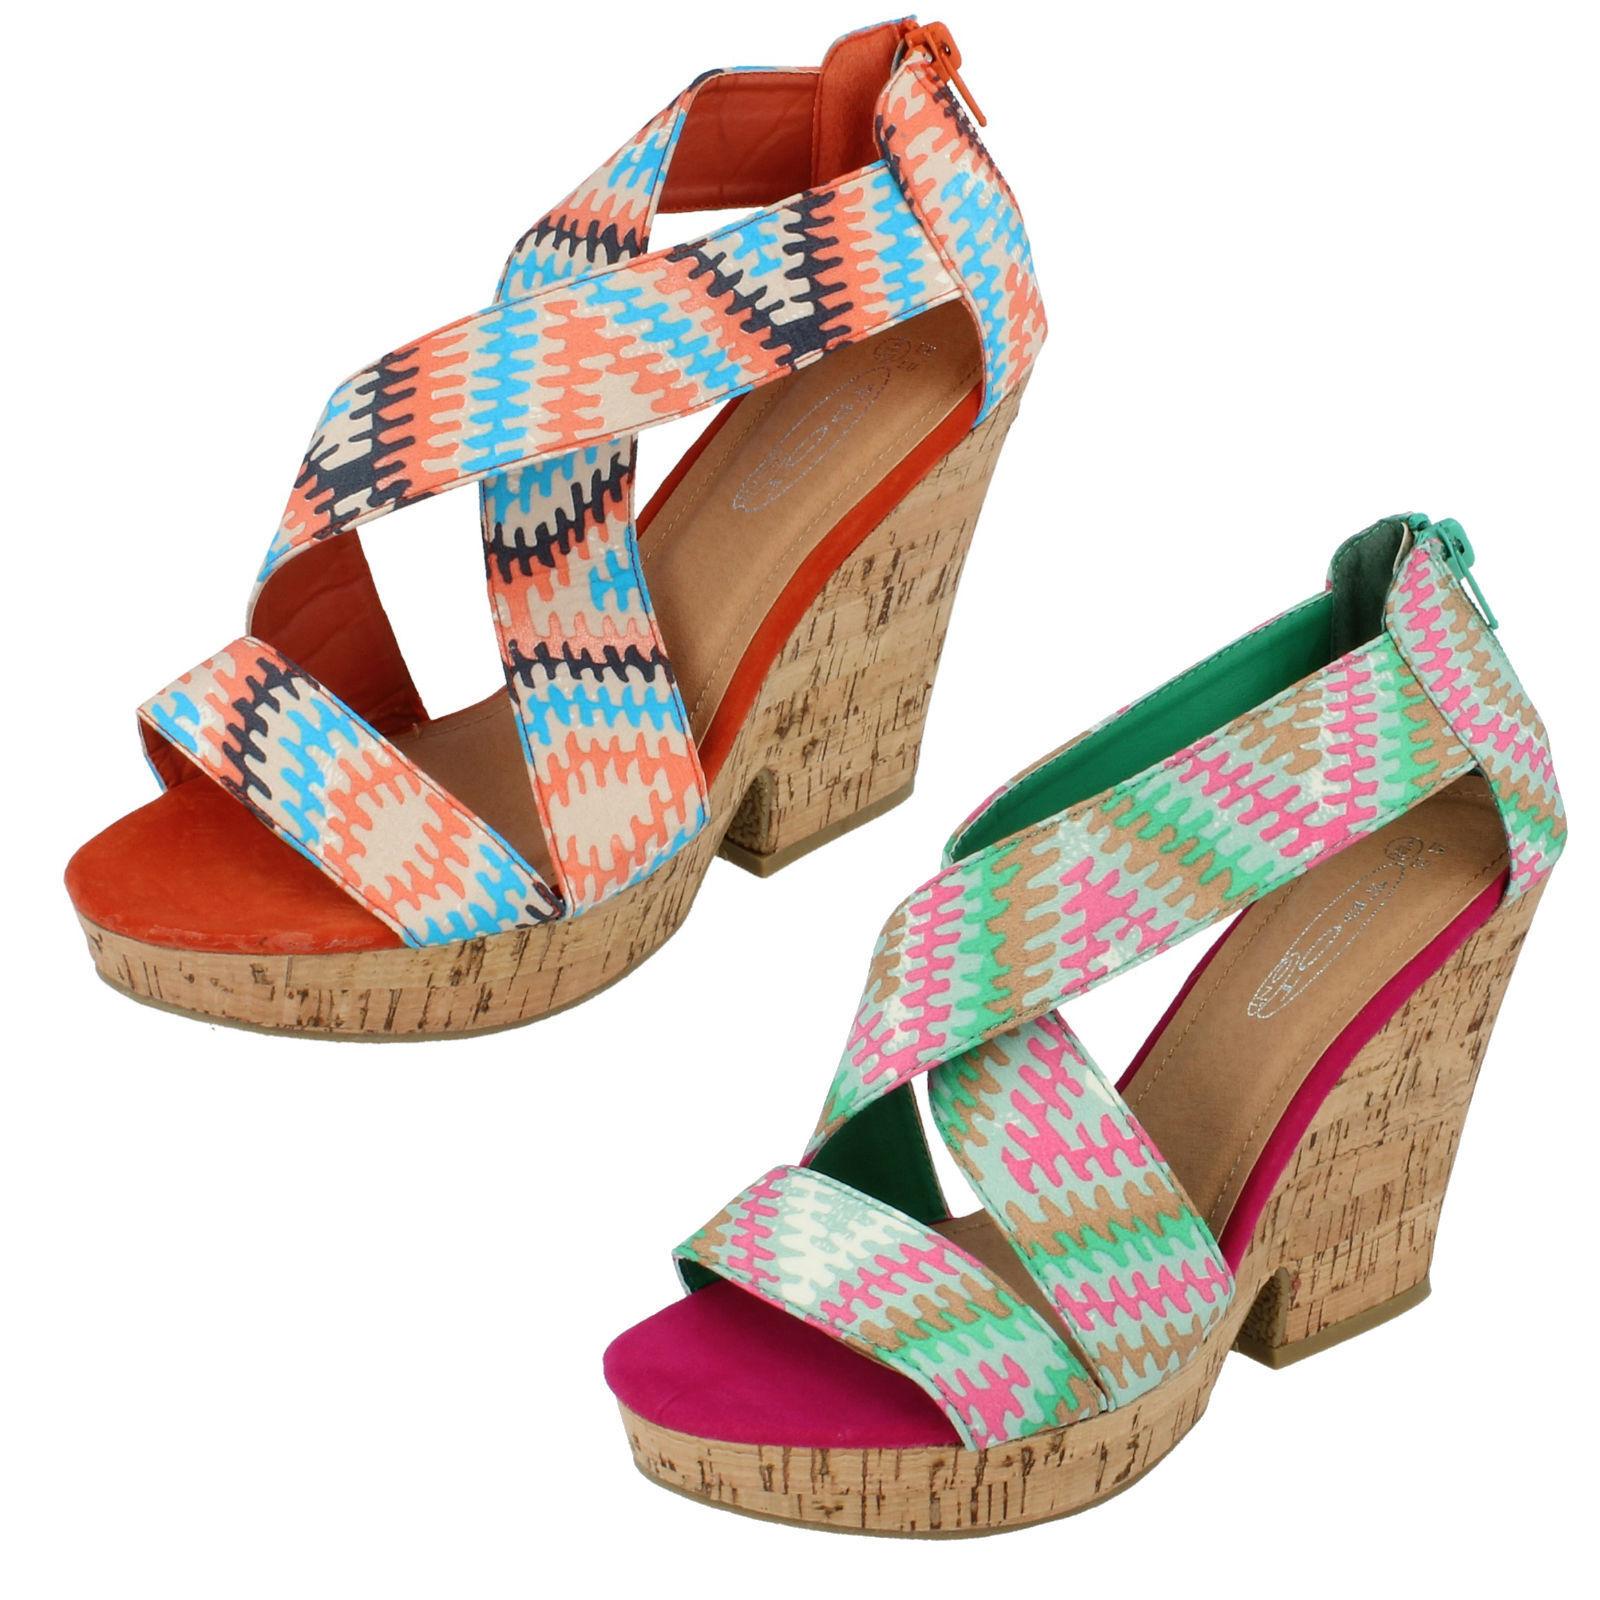 Ladies F10029 Cross On Strap Beach Sandals By Spot On Cross Retail Price f39298